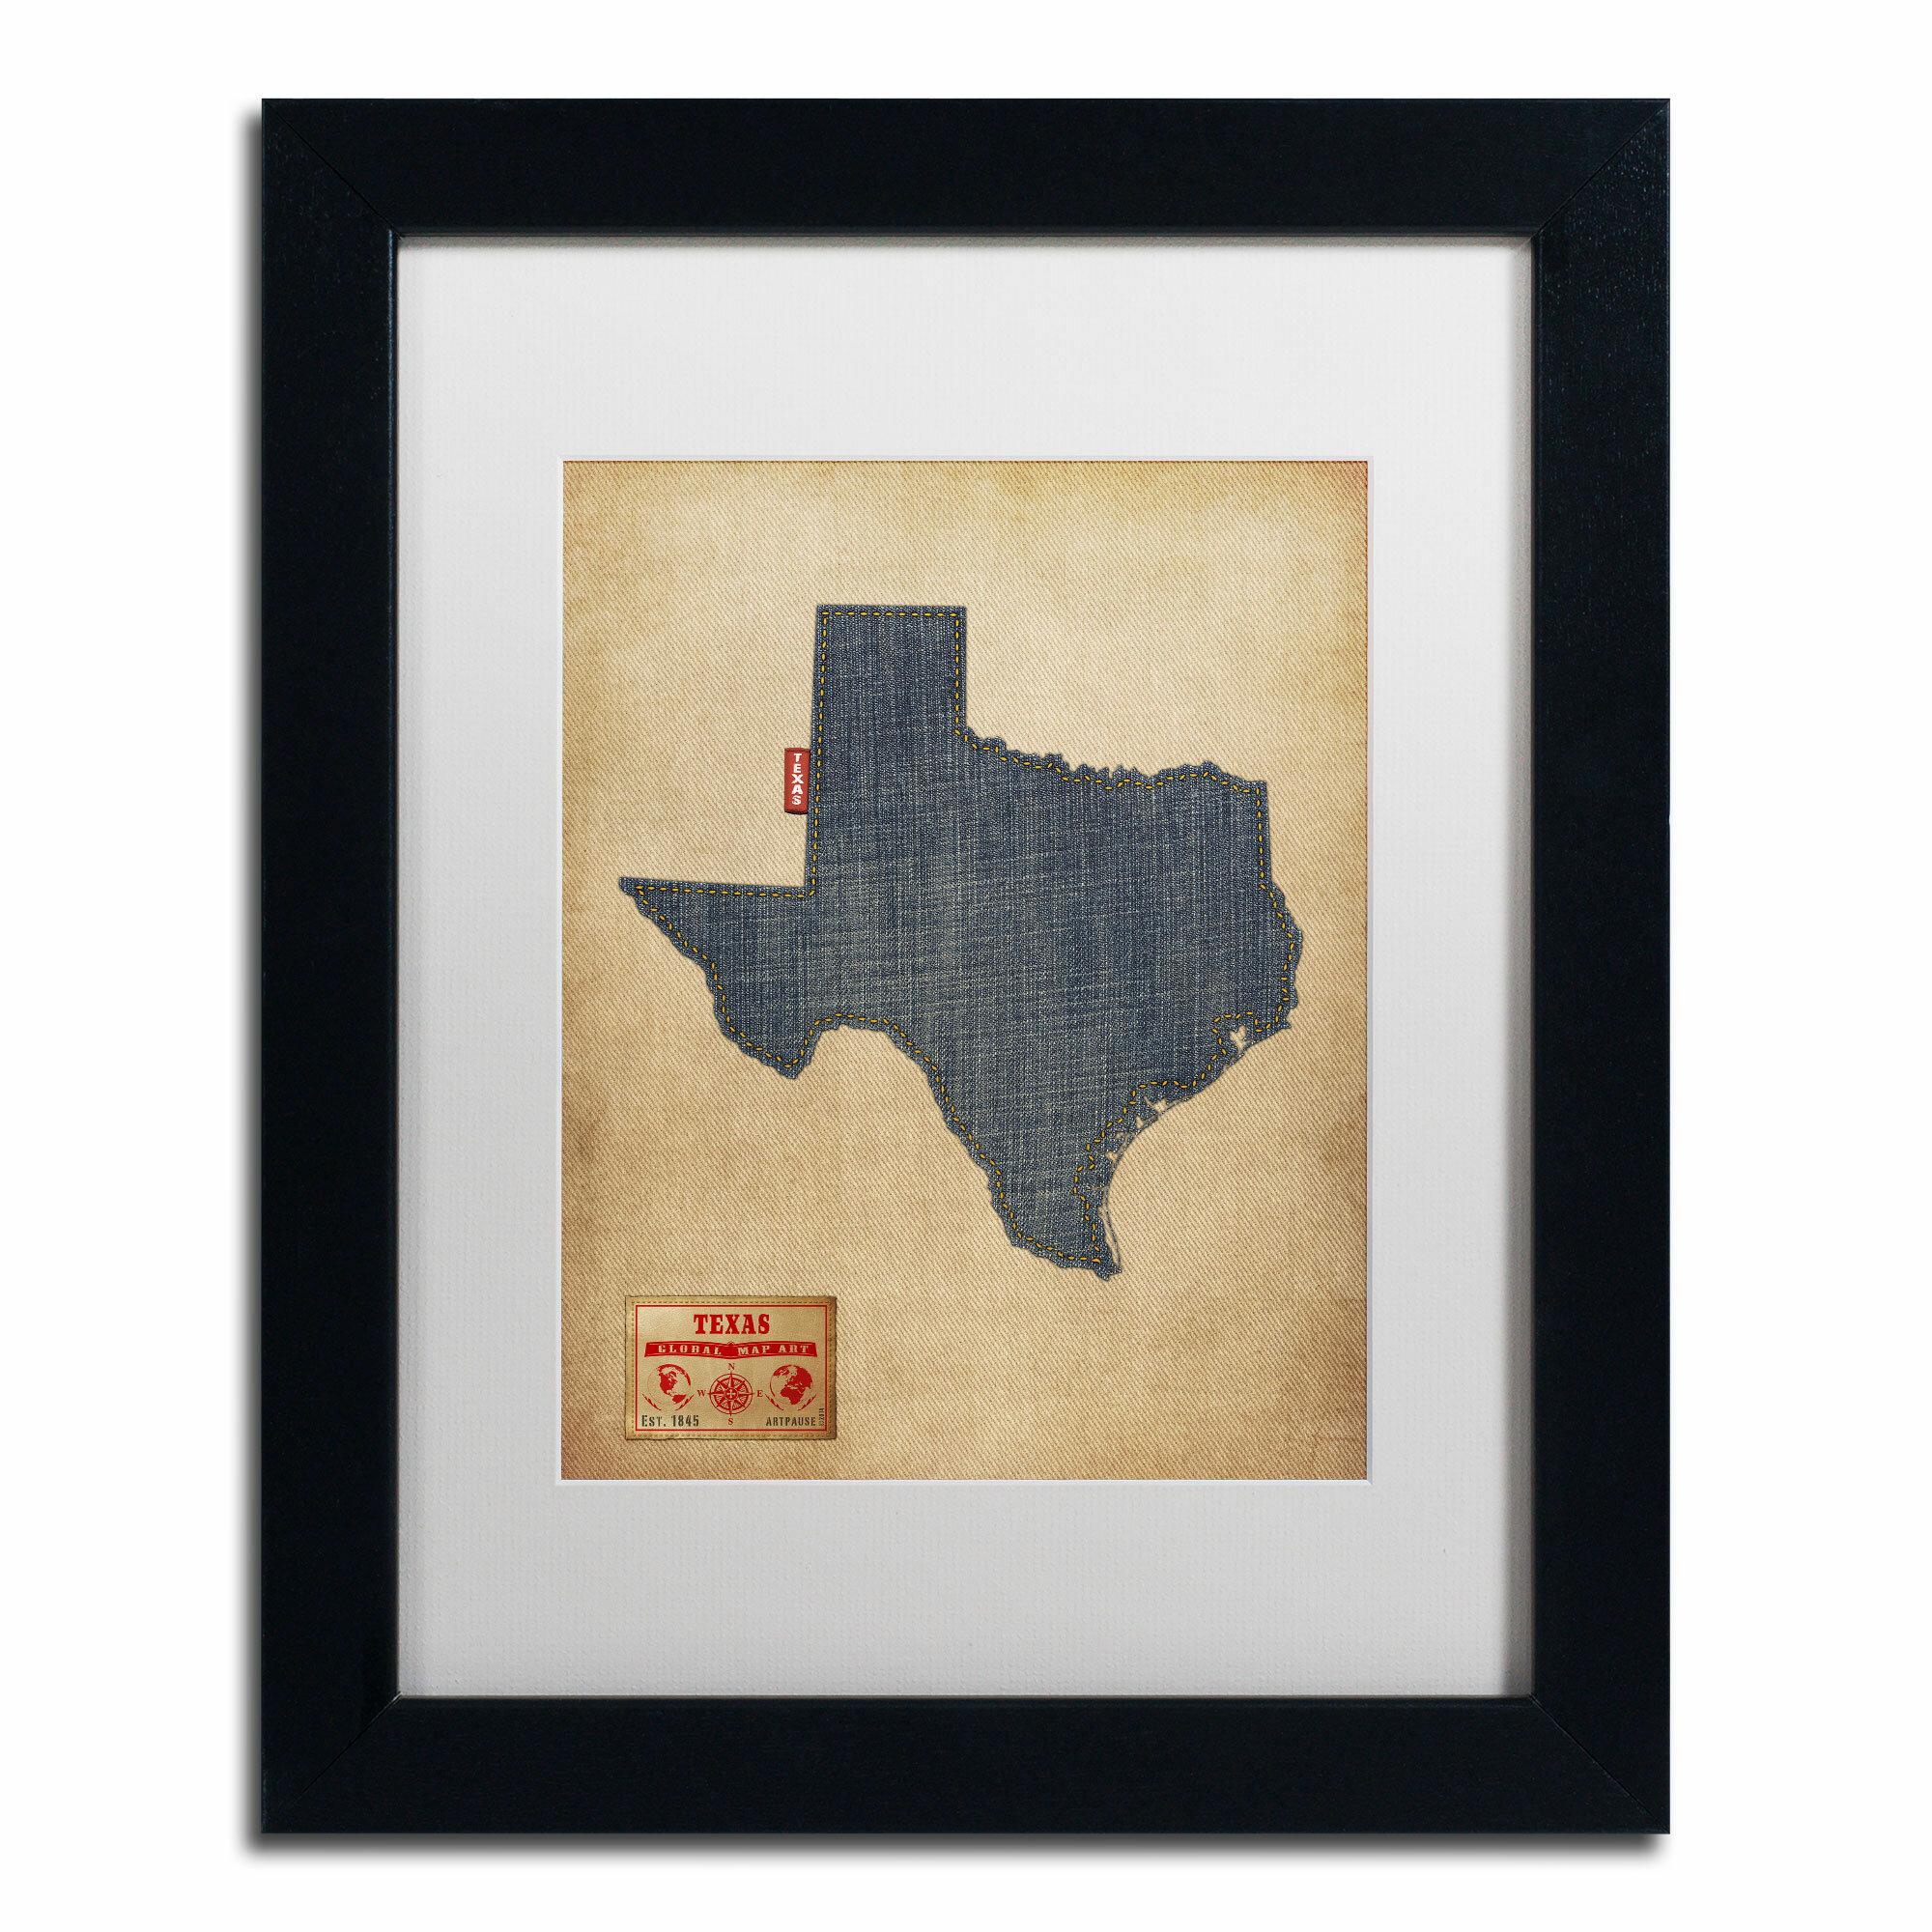 Trademark Art Texas Map Denim Jeans Style By Michael Tompsett Framed Graphic Art Wayfair